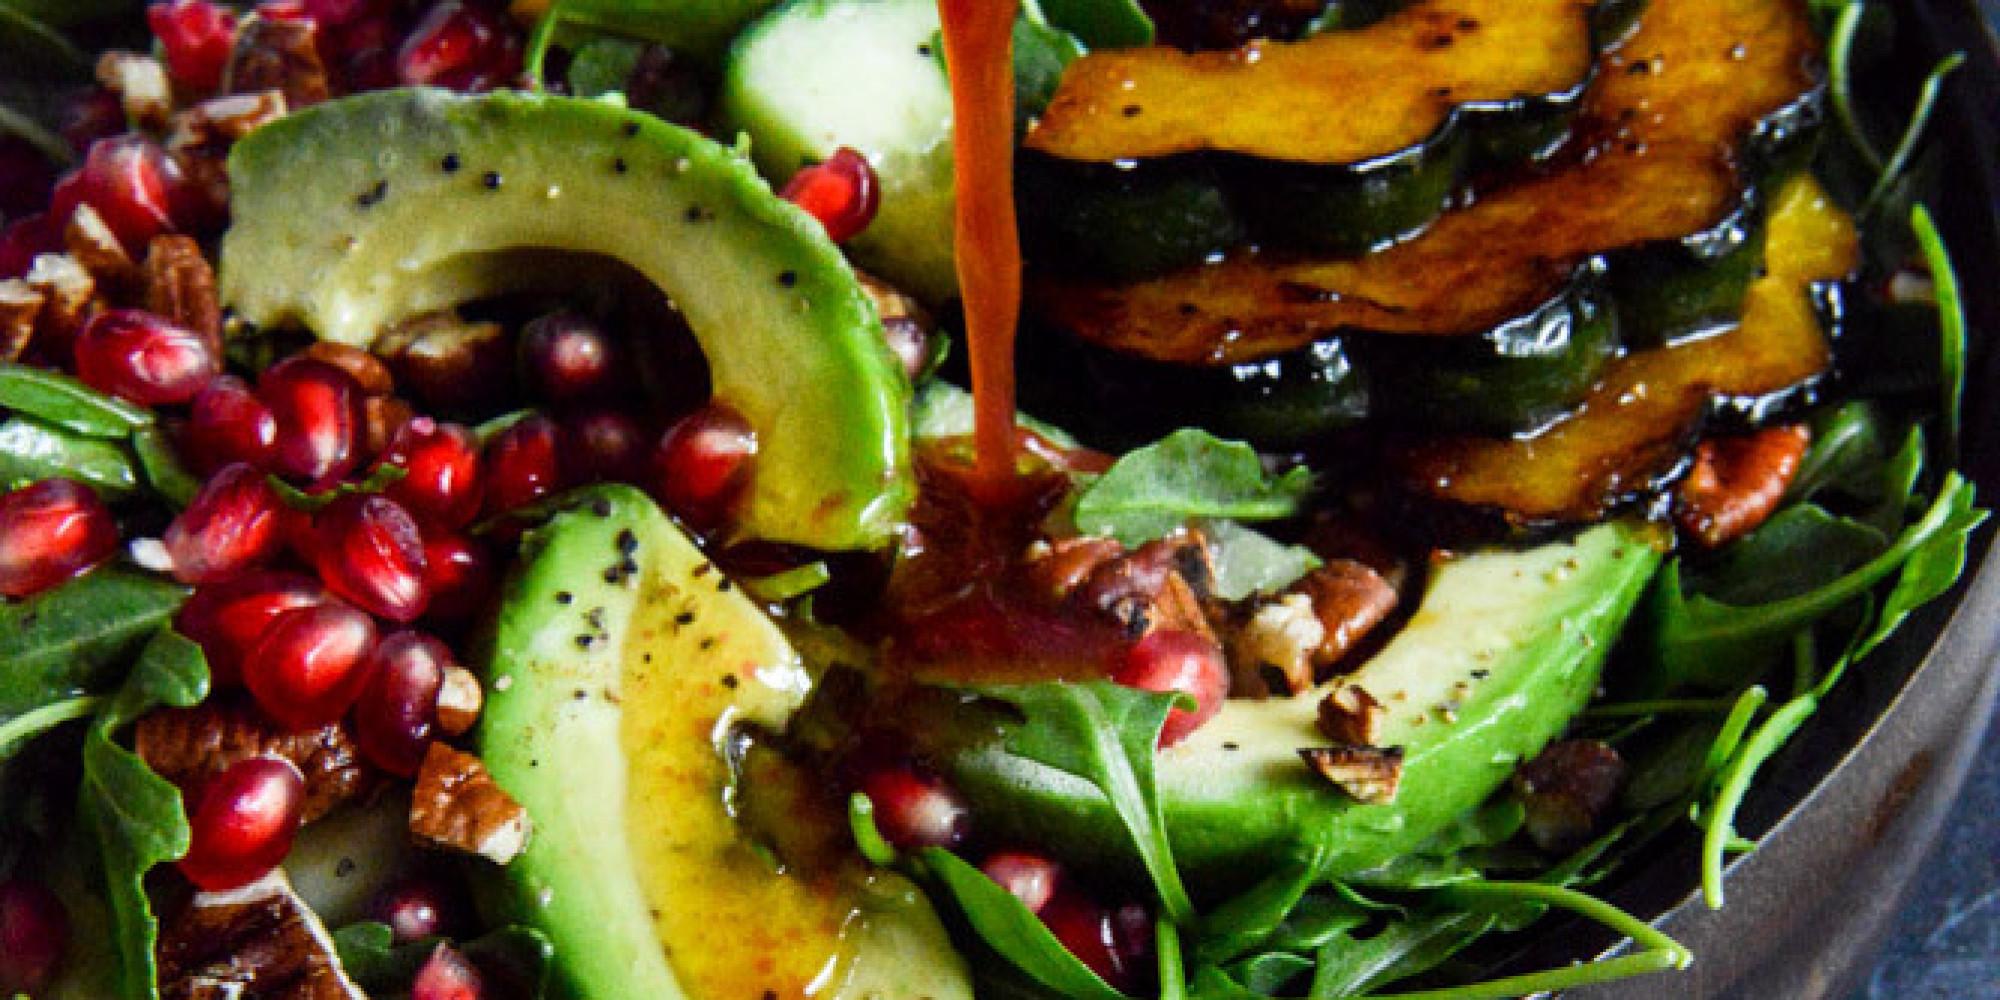 Healthy Fall Salads  Fall Salad Recipes To Stay Healthy This Season PHOTOS